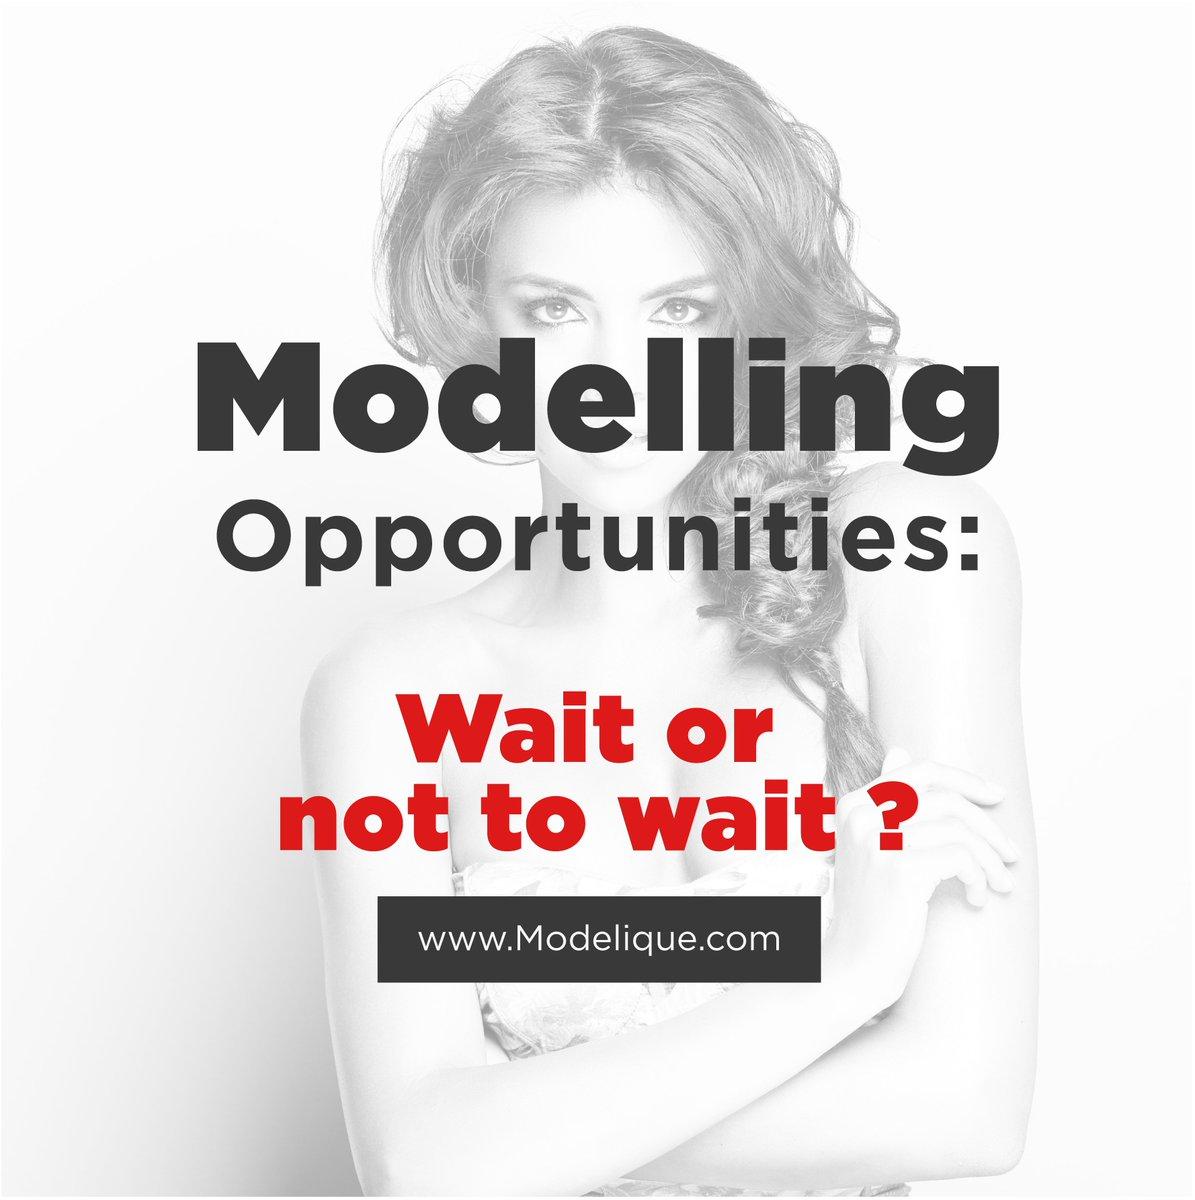 Your Decision #Modeling #Inspiration #Startup #Success #MakeYourOwnLane #defstar5 #mpgvip #bitcoin #model #MondayMotivation @Modelique1<br>http://pic.twitter.com/hyRjM6EZoe